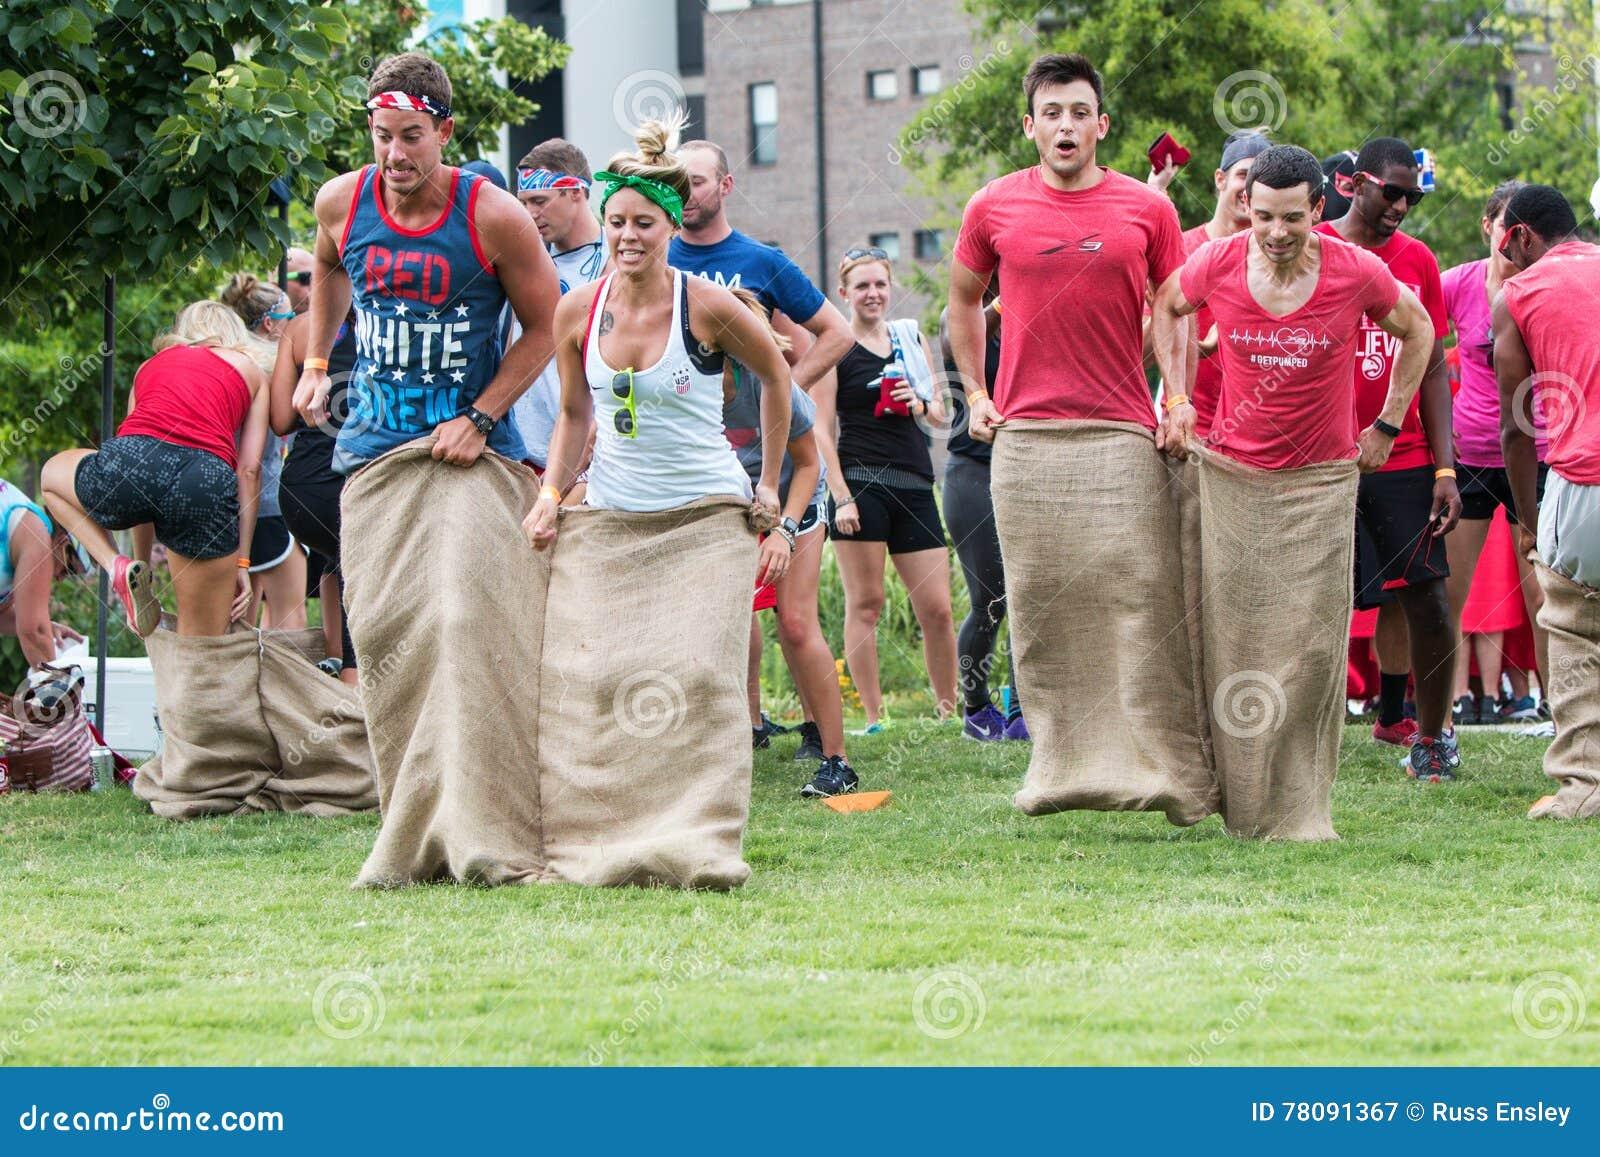 Potato sack race field day